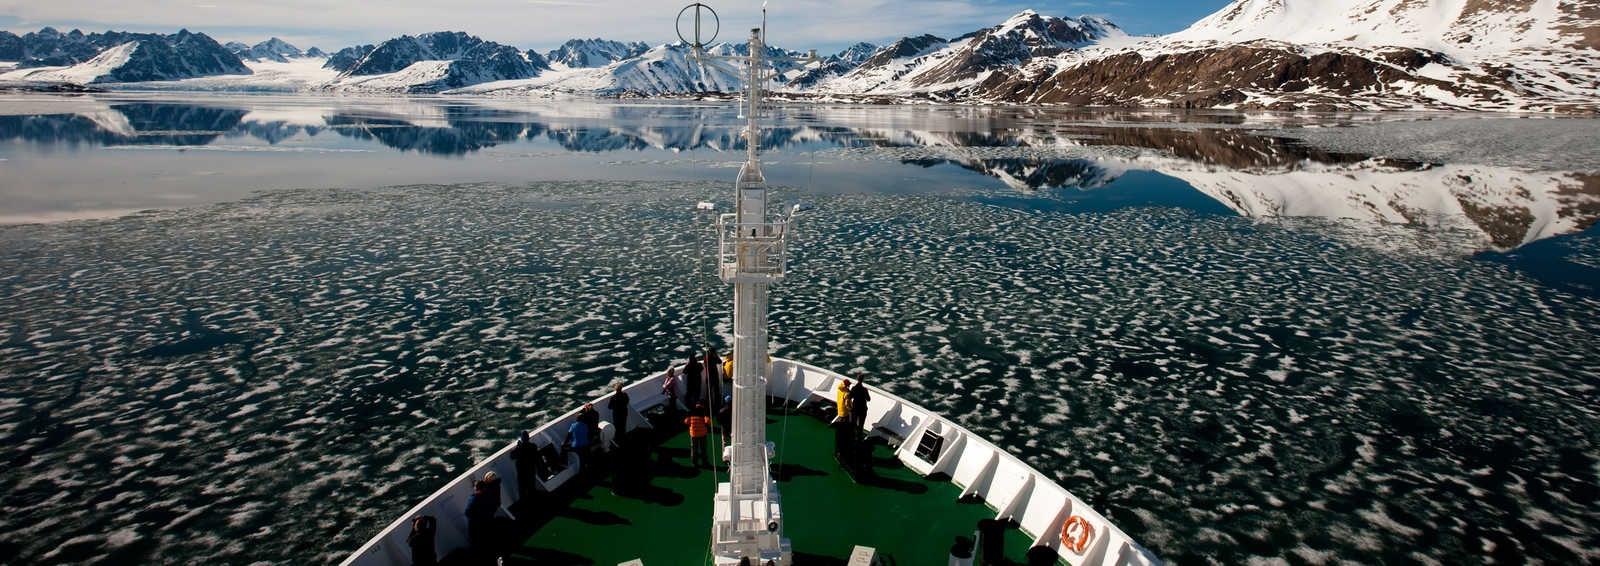 Spitzbergen scenery